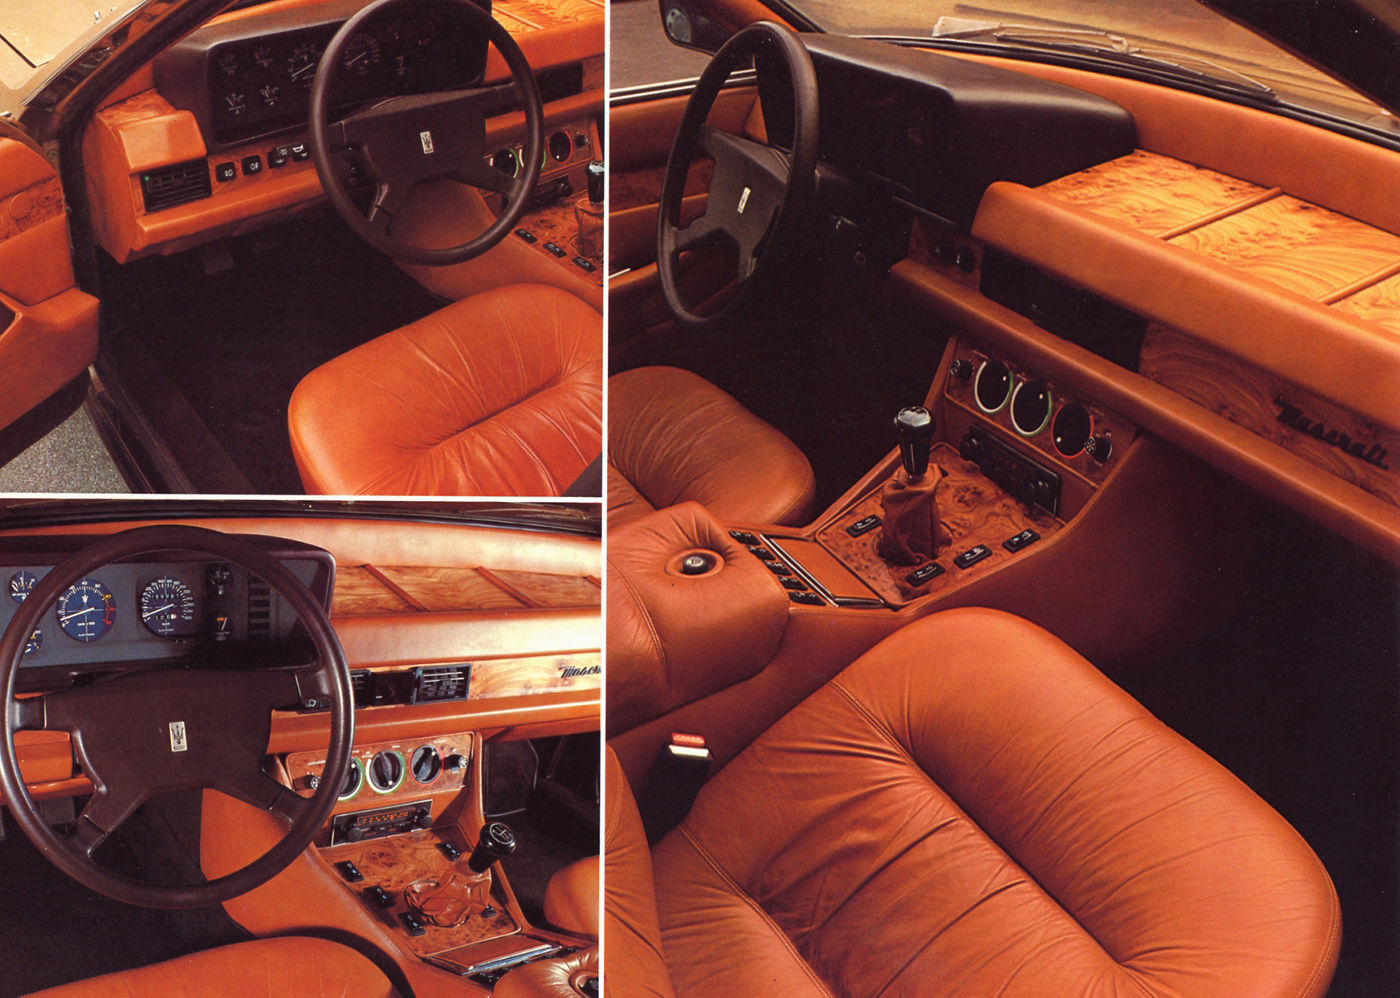 1978 Maserati Quattroporte III - interior view of the classic 5-seater sedan